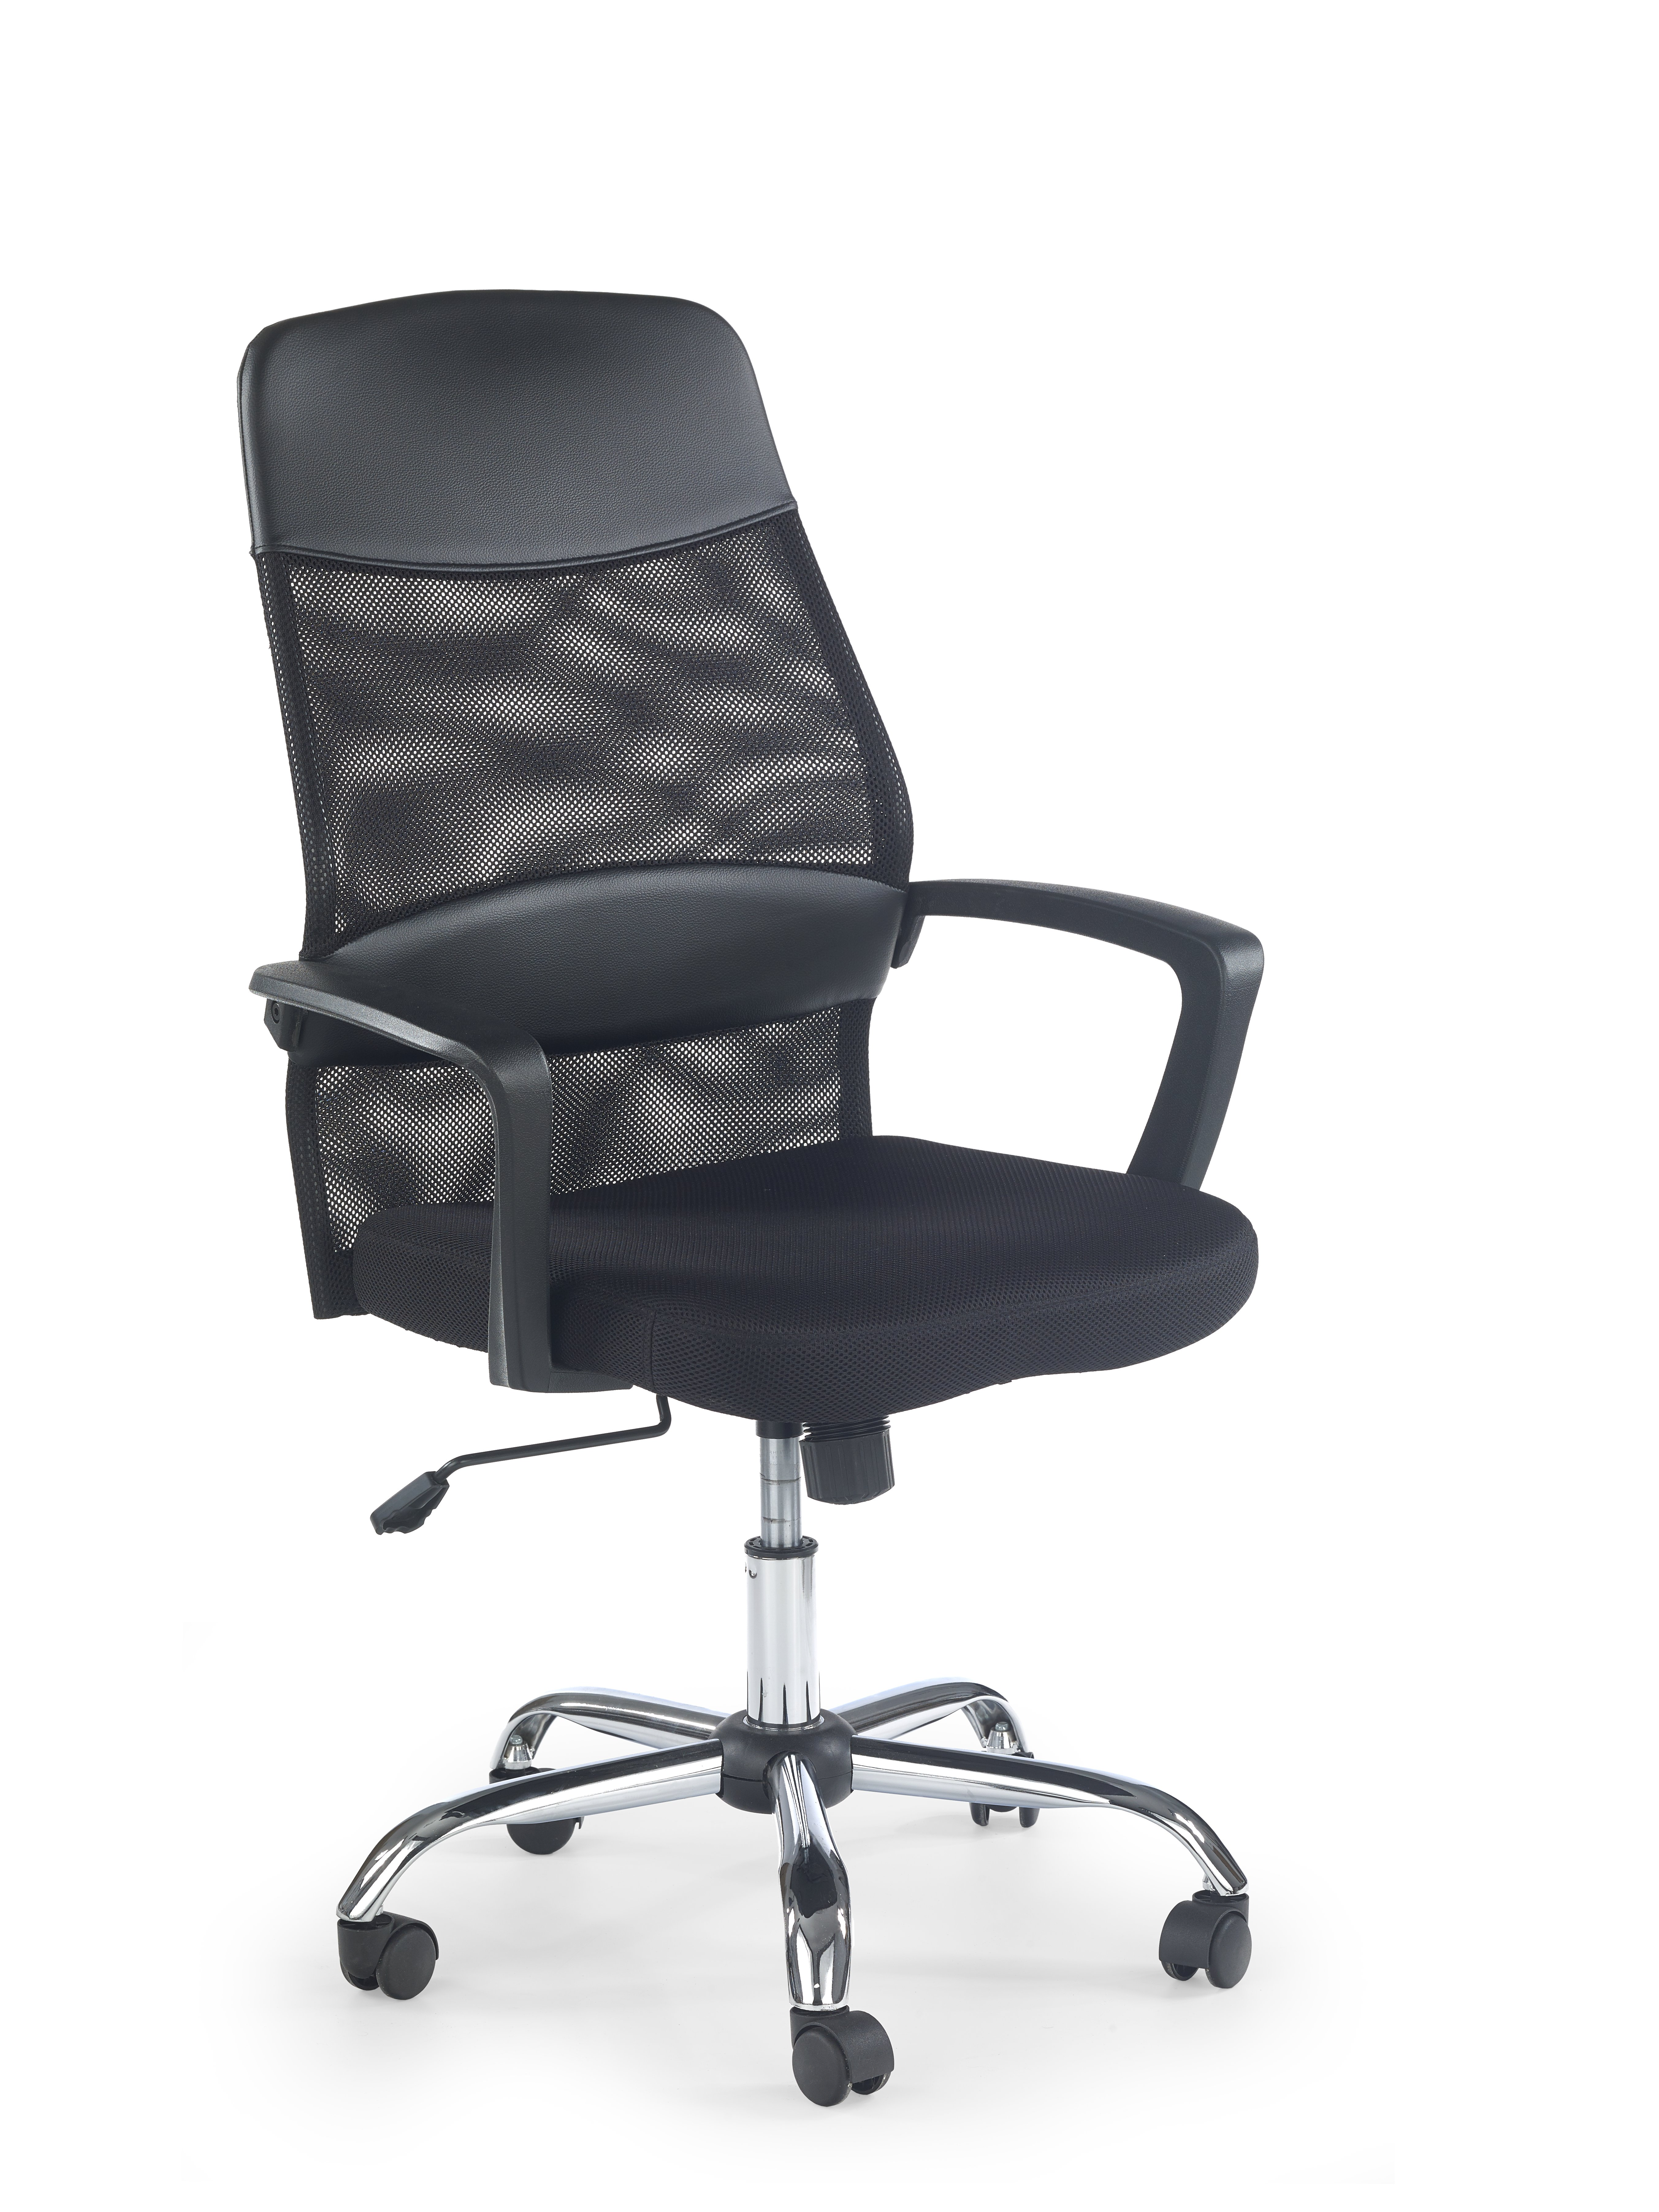 Scaun de birou ergonomic Carbon Black